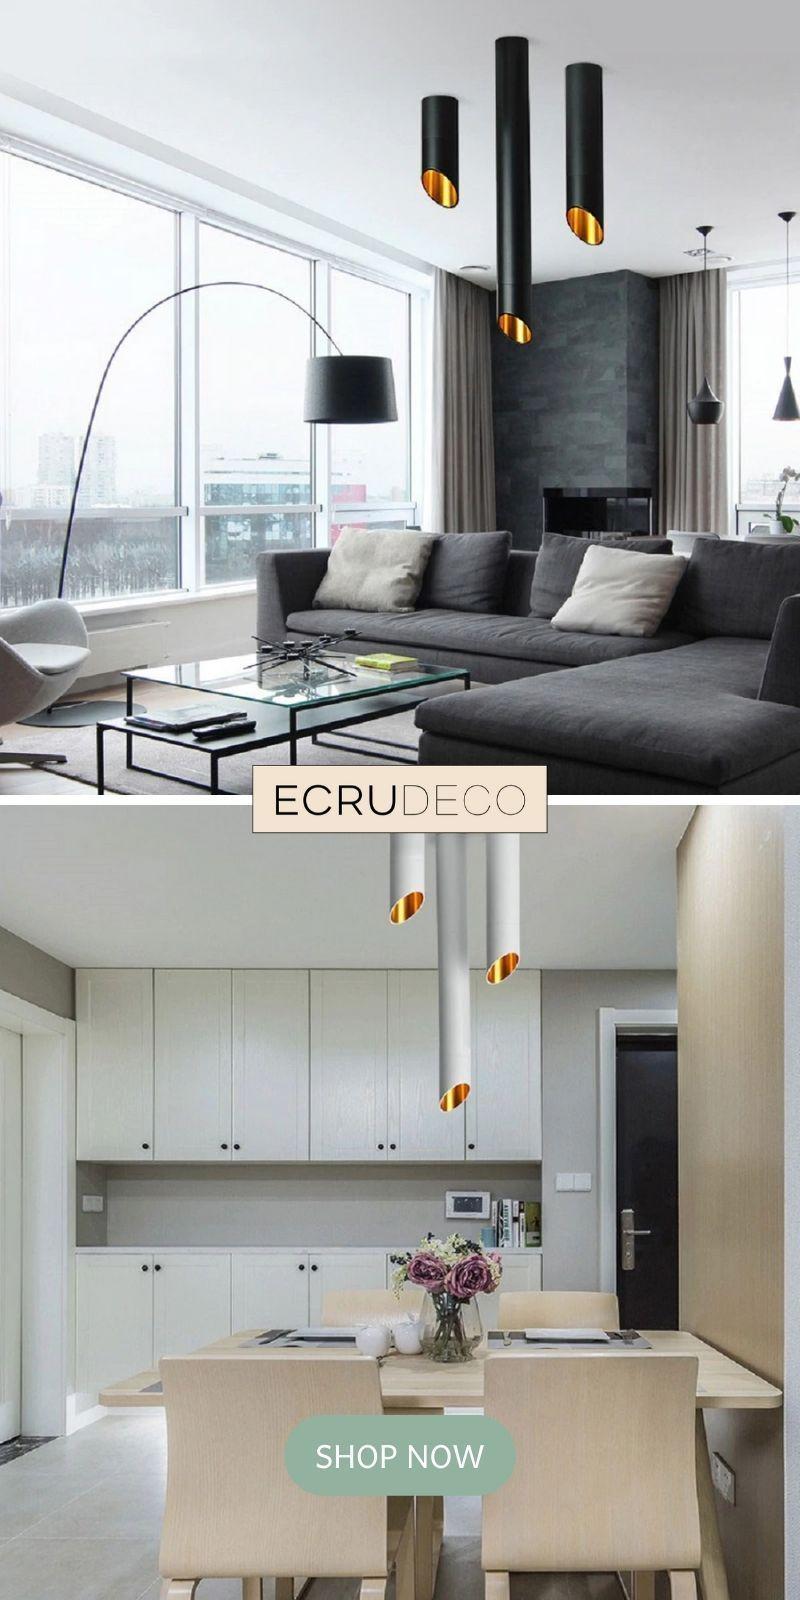 Krause Modern Tube Lamp Gu10 7w Ecrudeco Com In 2020 Living Room Lighting Stylish Living Room Modern Ceiling Light #tube #lights #for #living #room